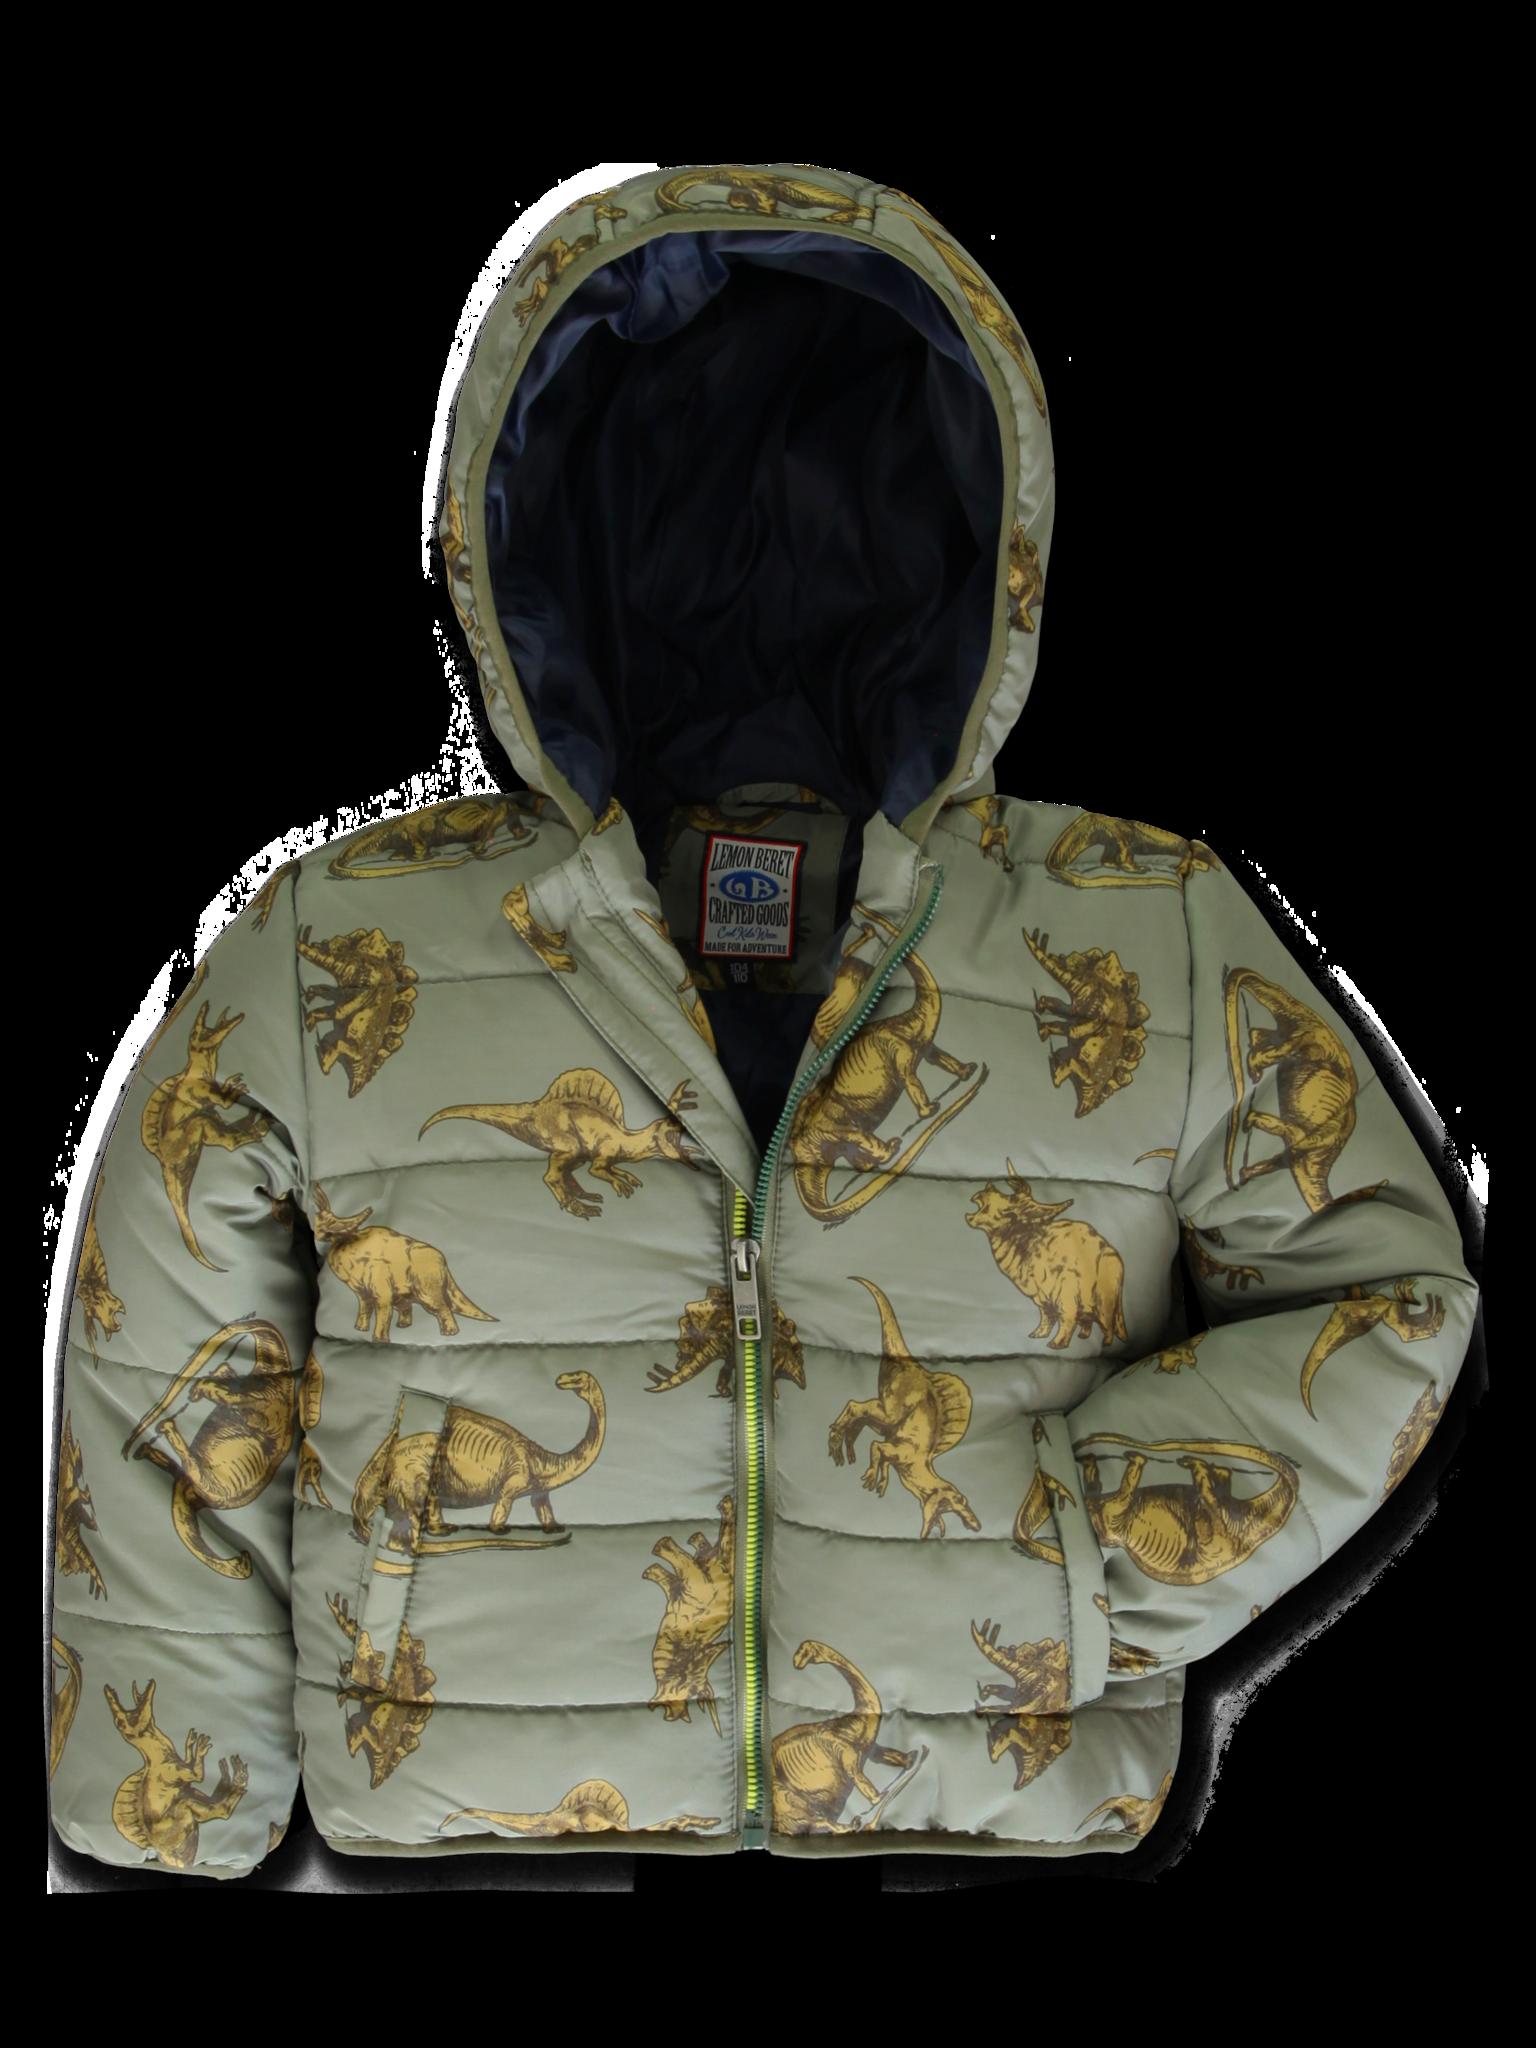 All Brands | Winterproducts Small Boys | Jacket | 10 pcs/box